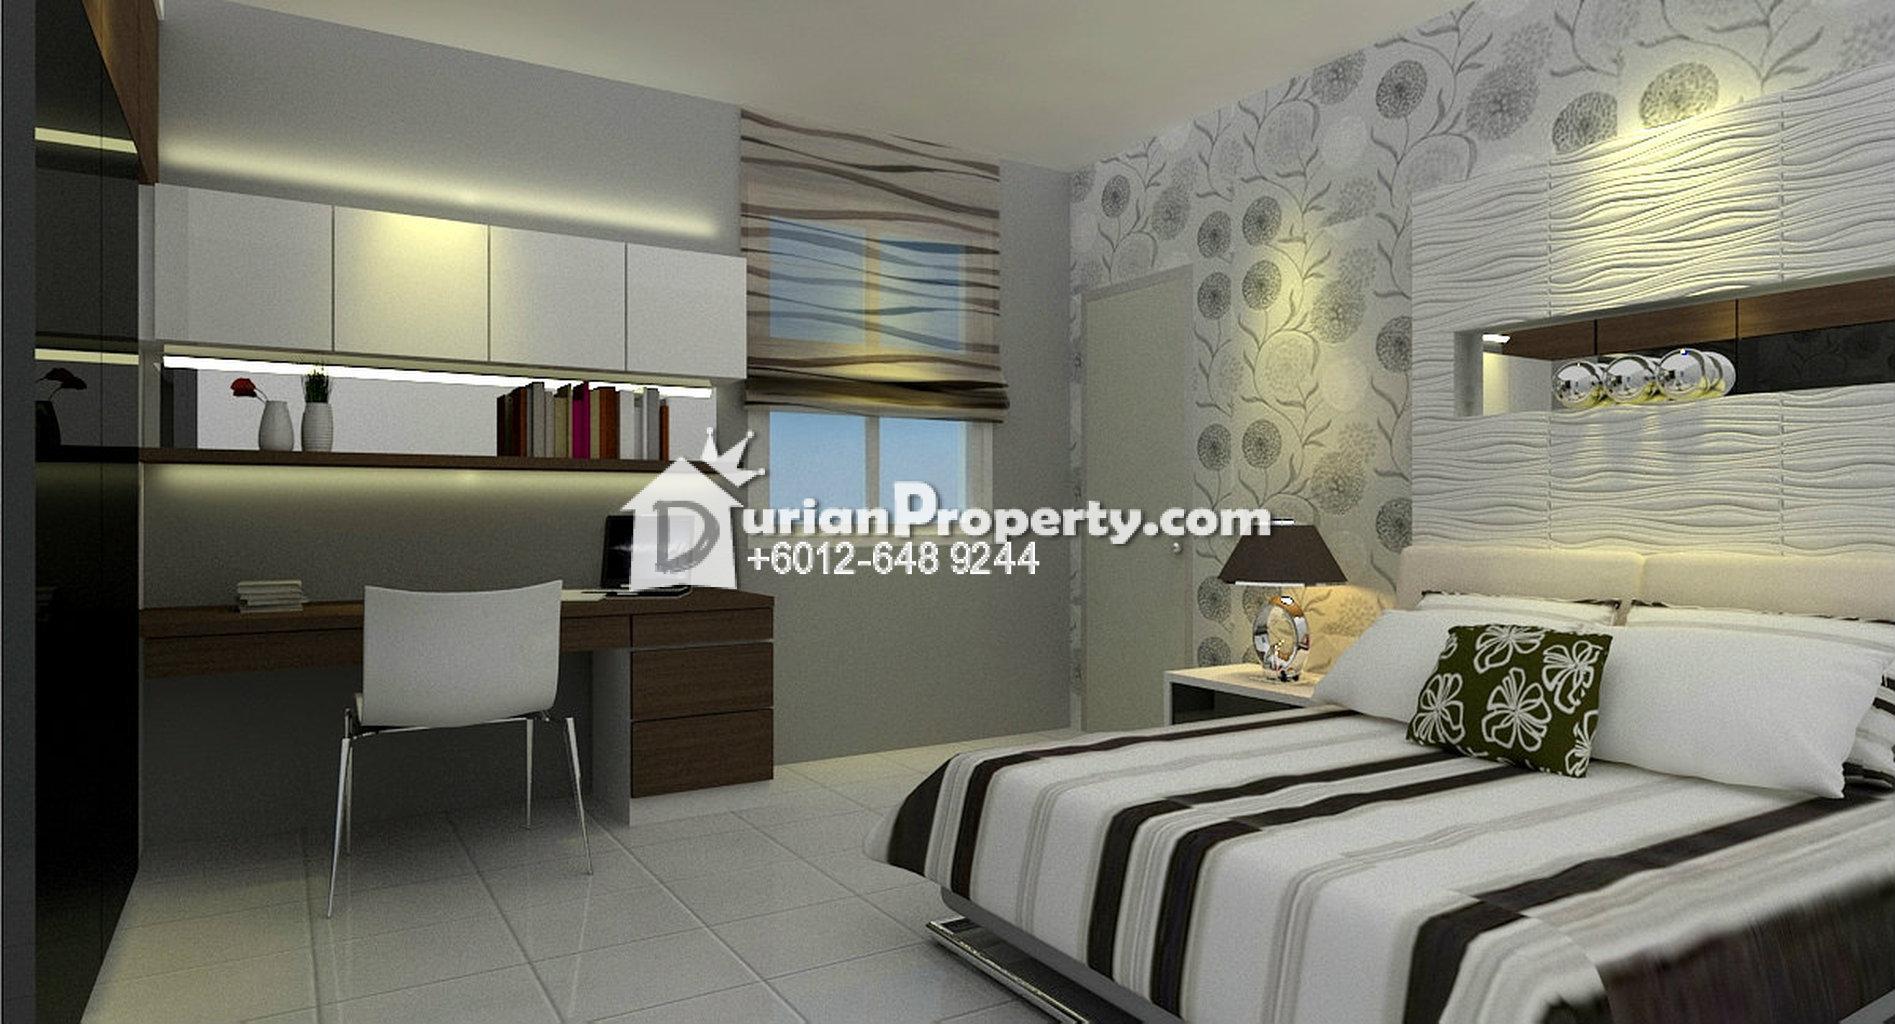 Superlink for sale at pandan indah pandan for rm558000 by for Design hotel pandan indah